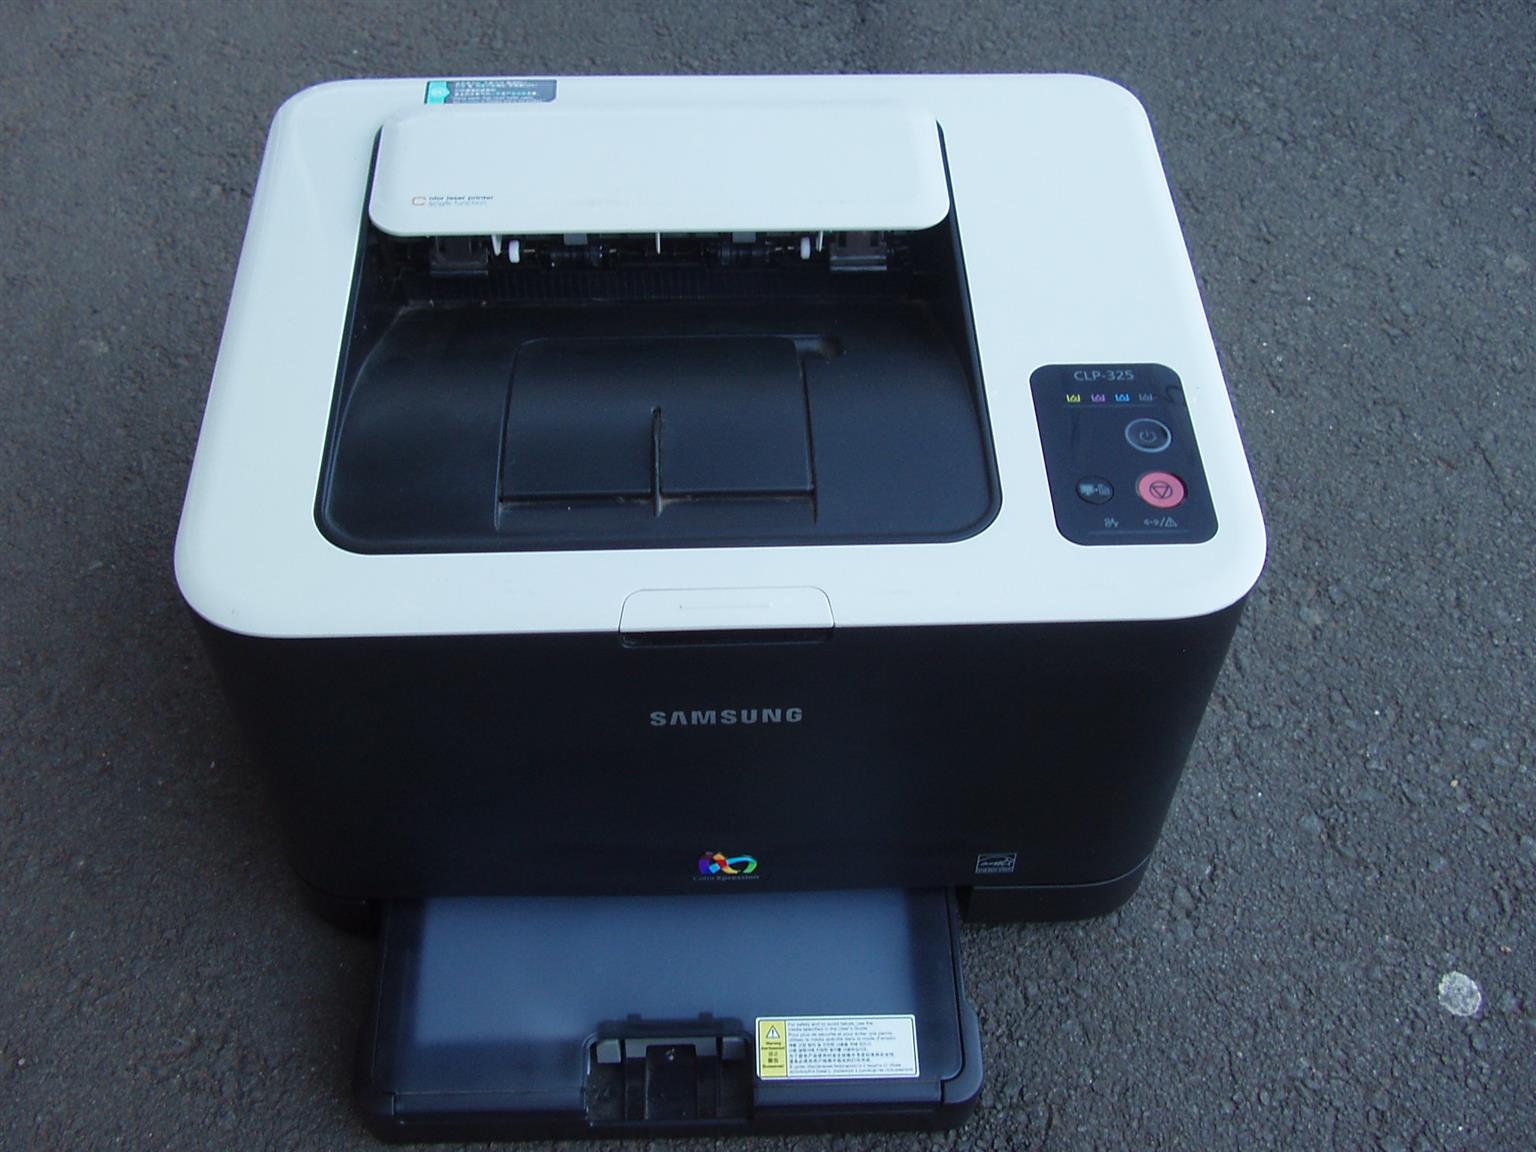 Samsung Color Laser Printer (CLP-325) - in excellent condition